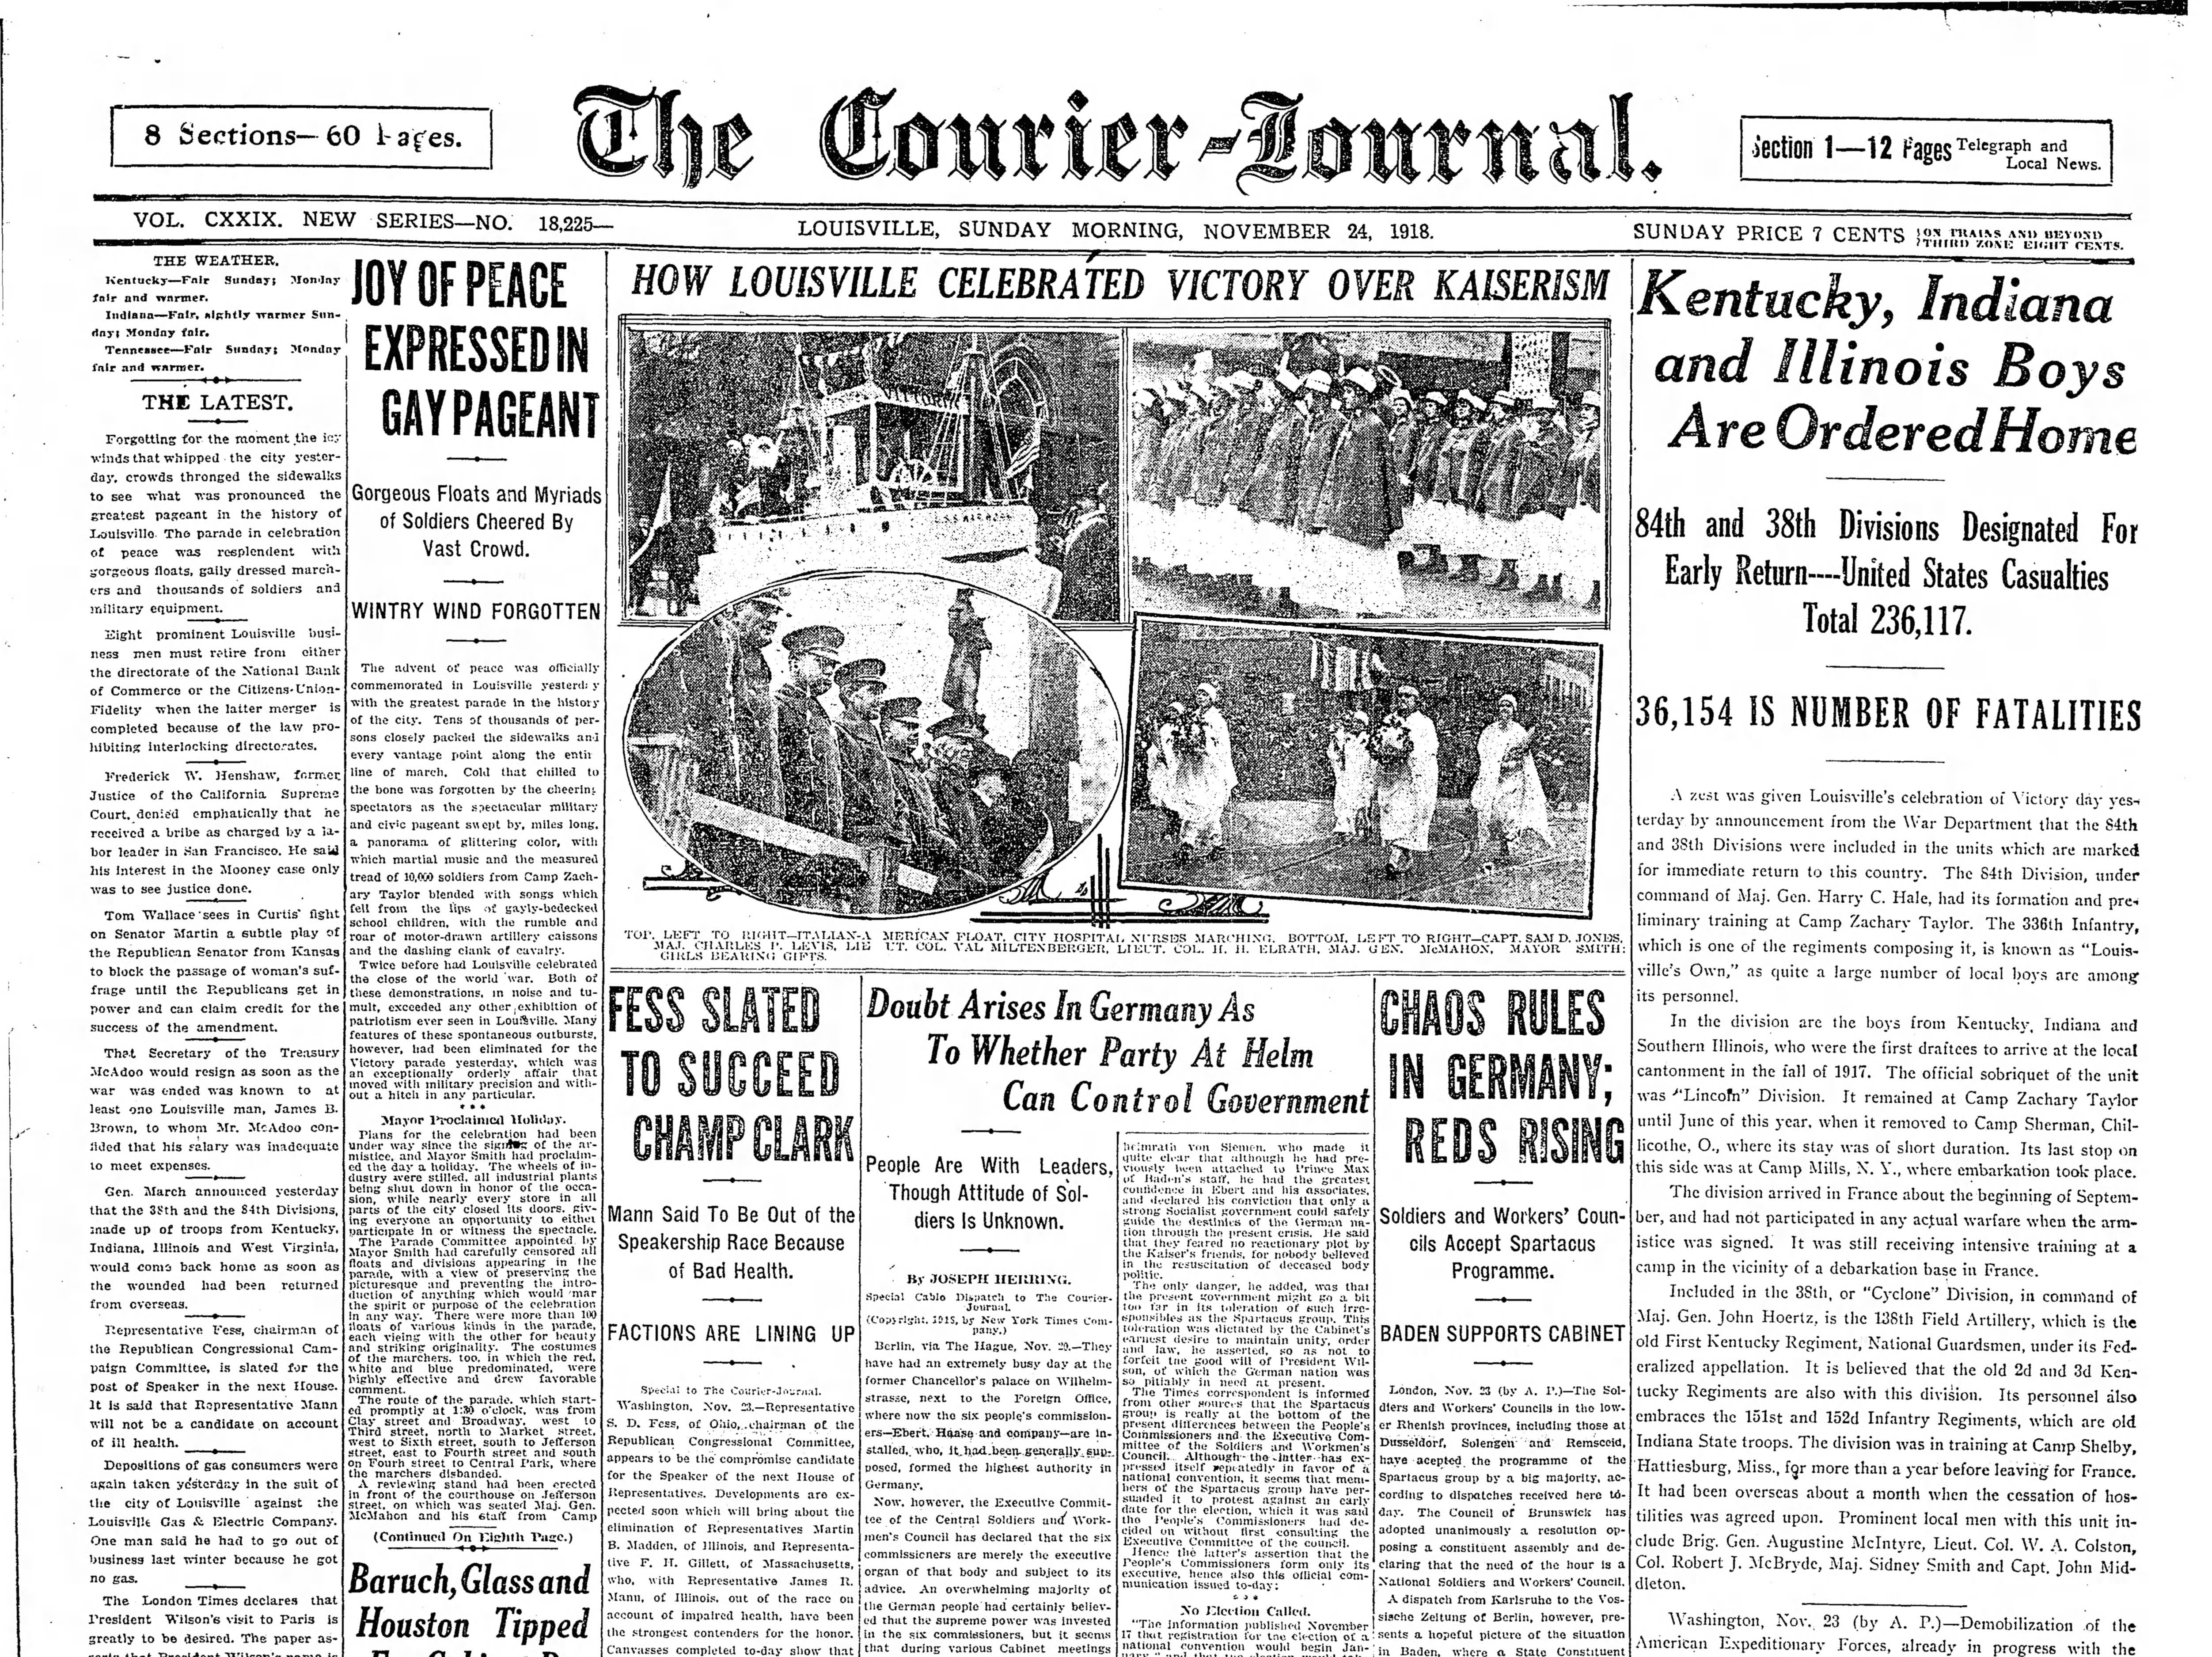 Headlines through World War I.